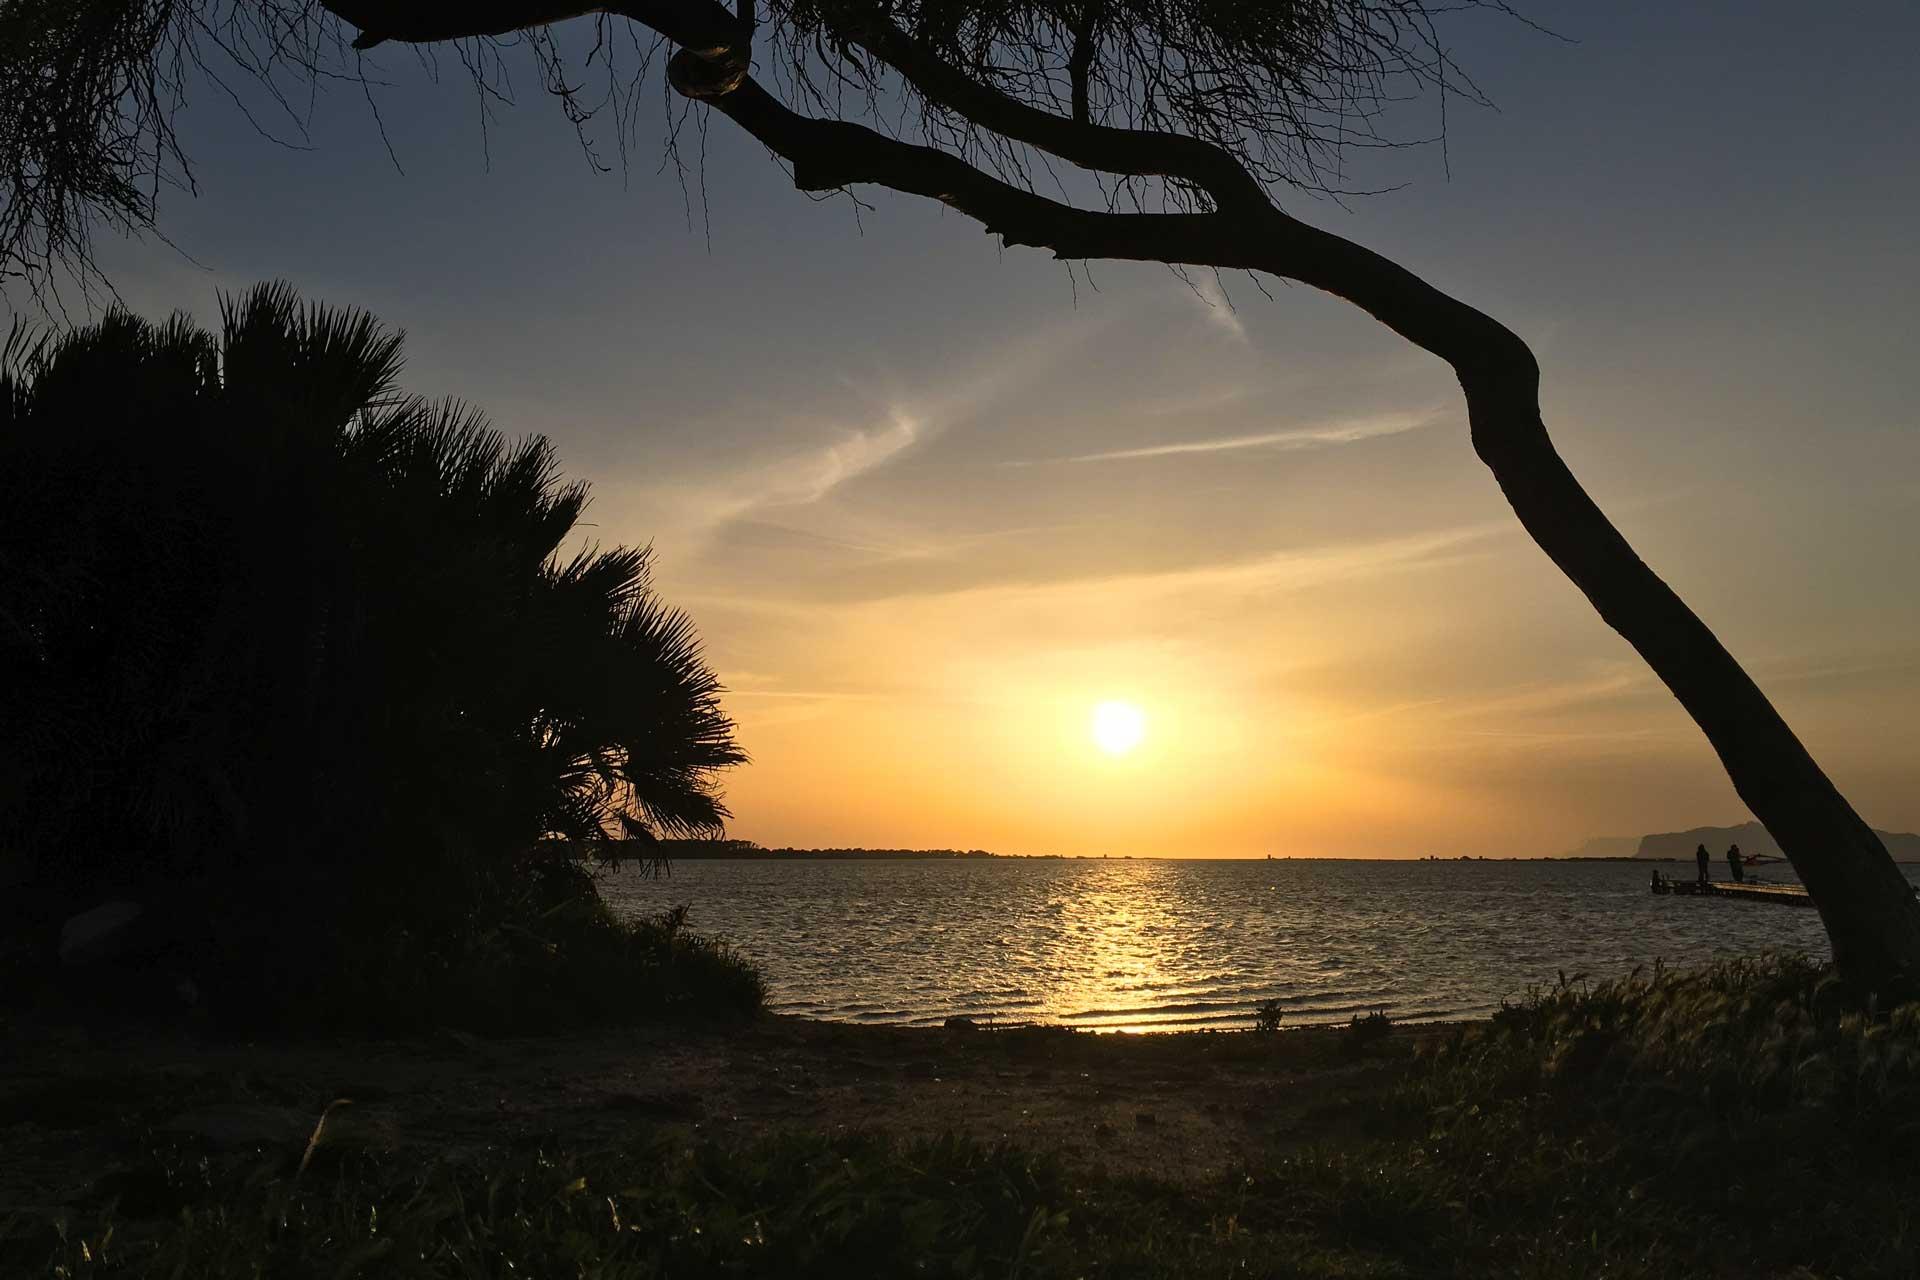 tramonti-laguna-dello-stagnone-kitesurf-06